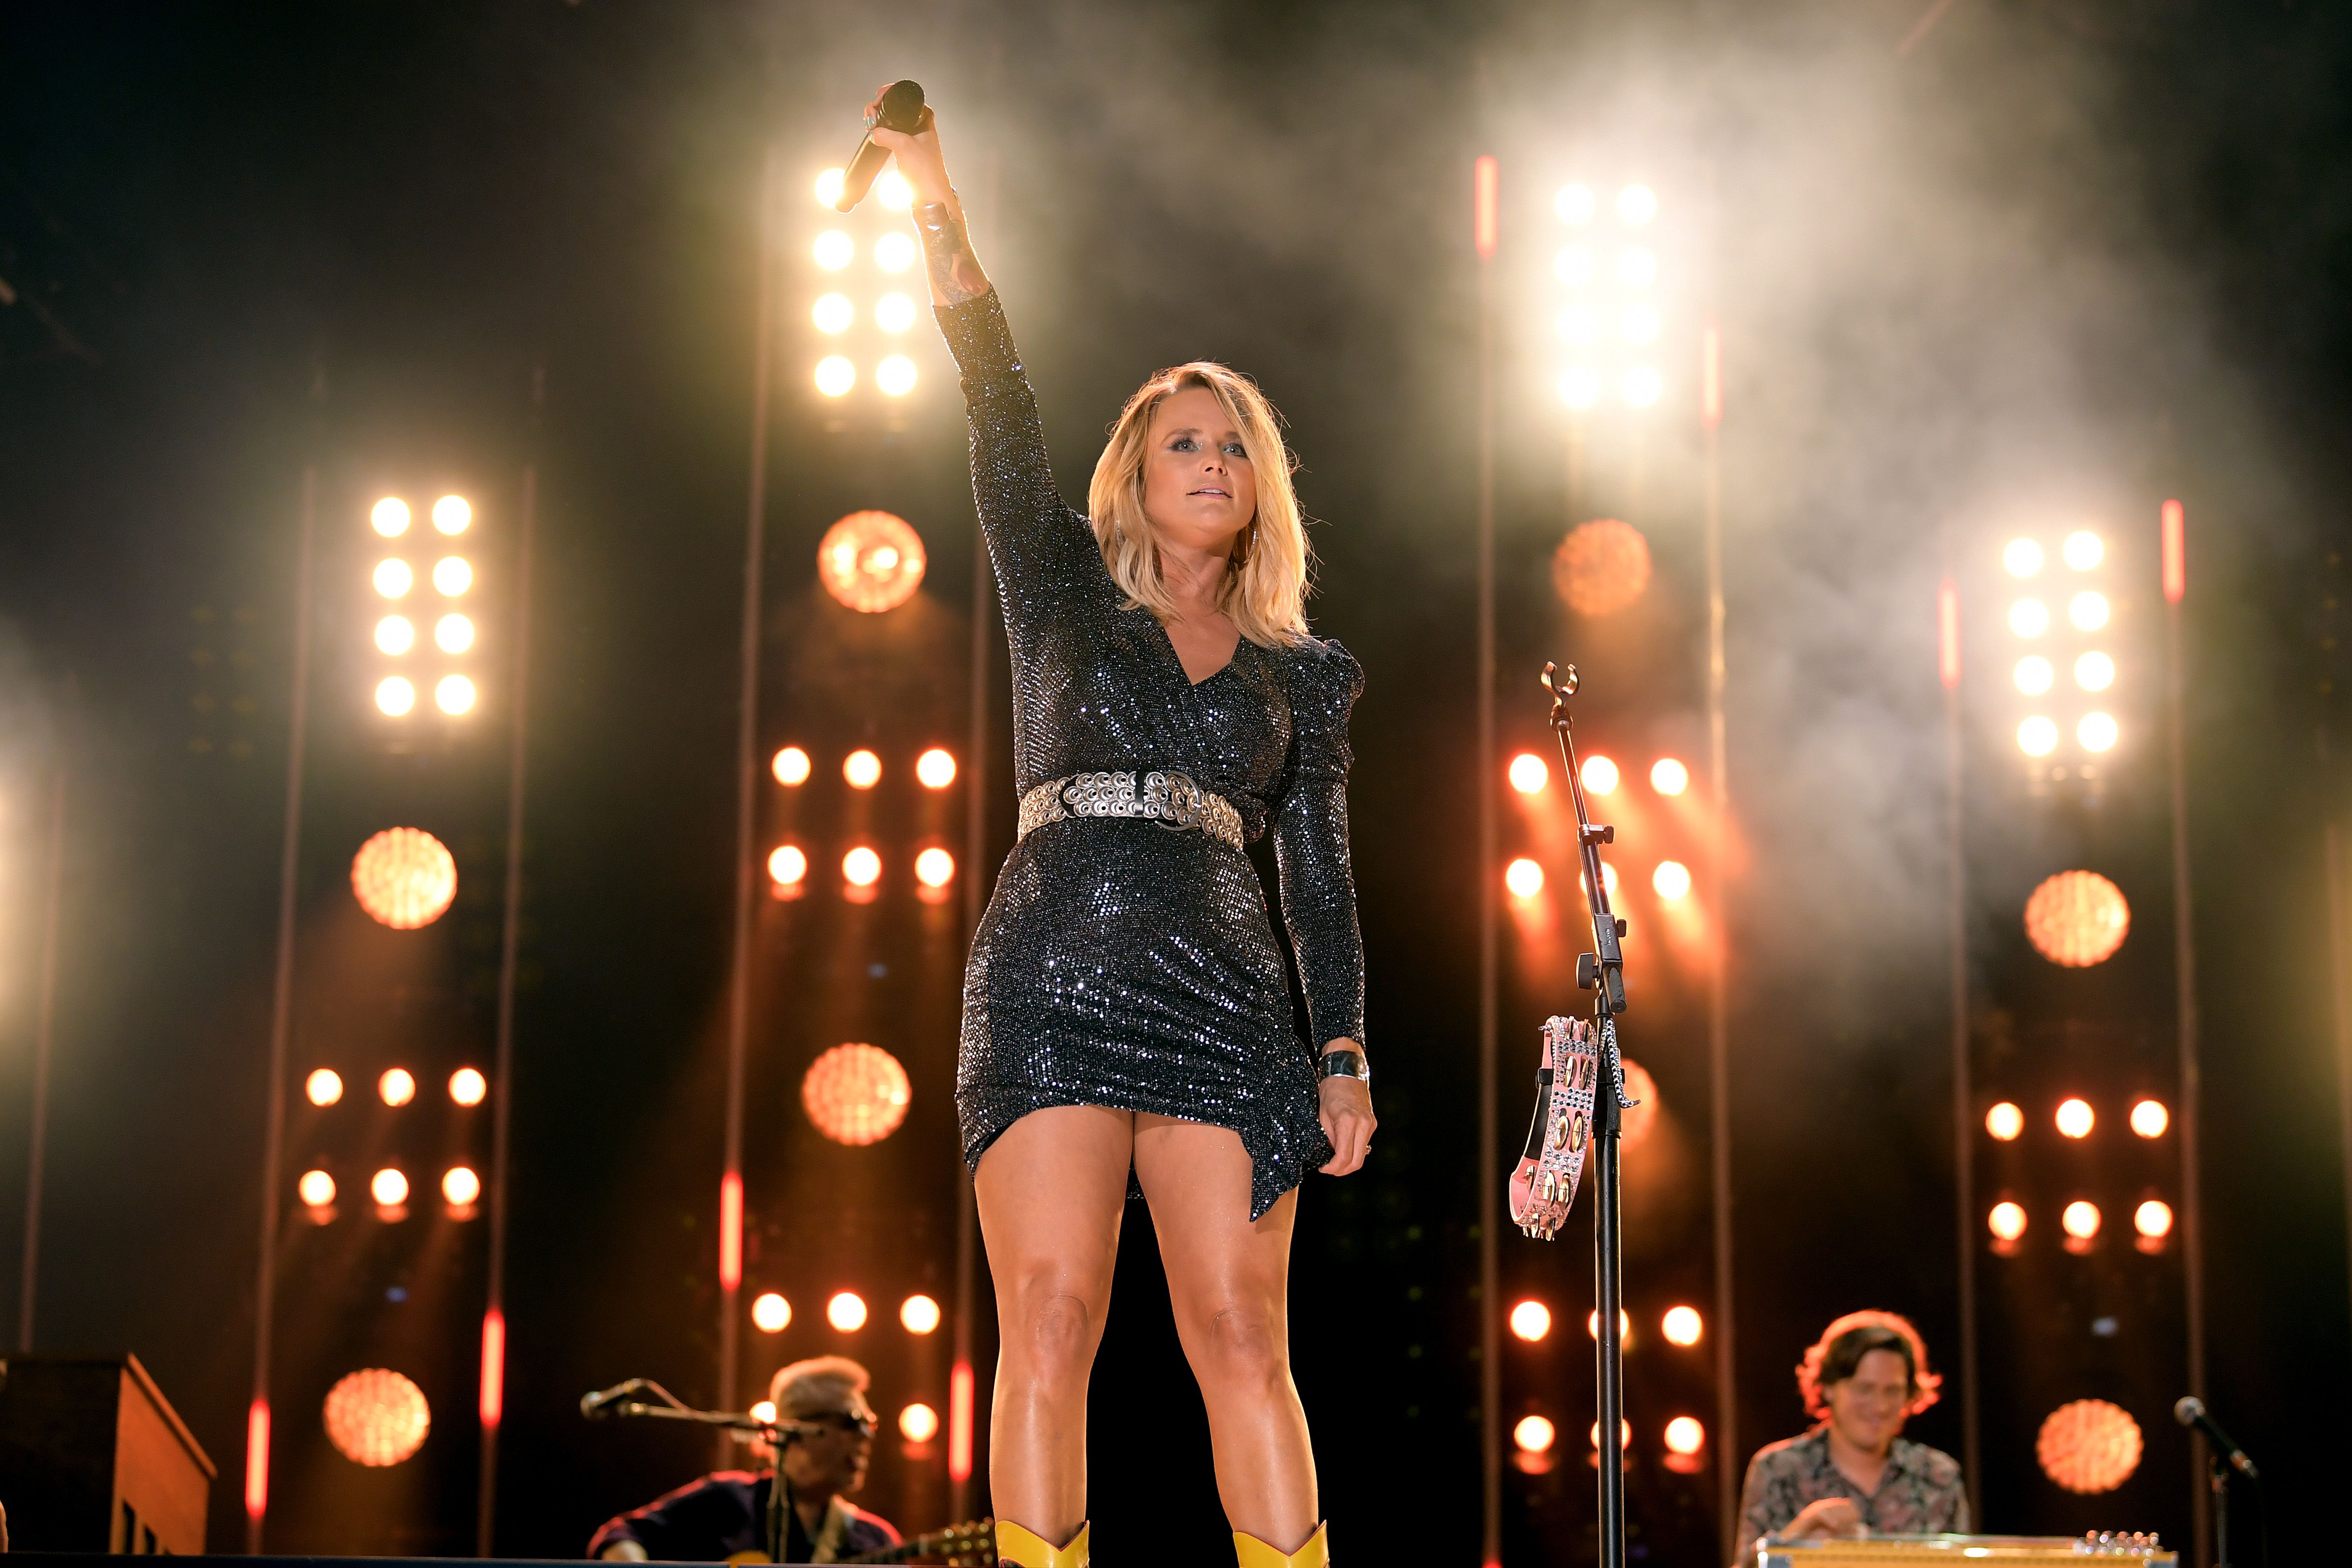 Miranda Lambert holding up a microphone on stage.